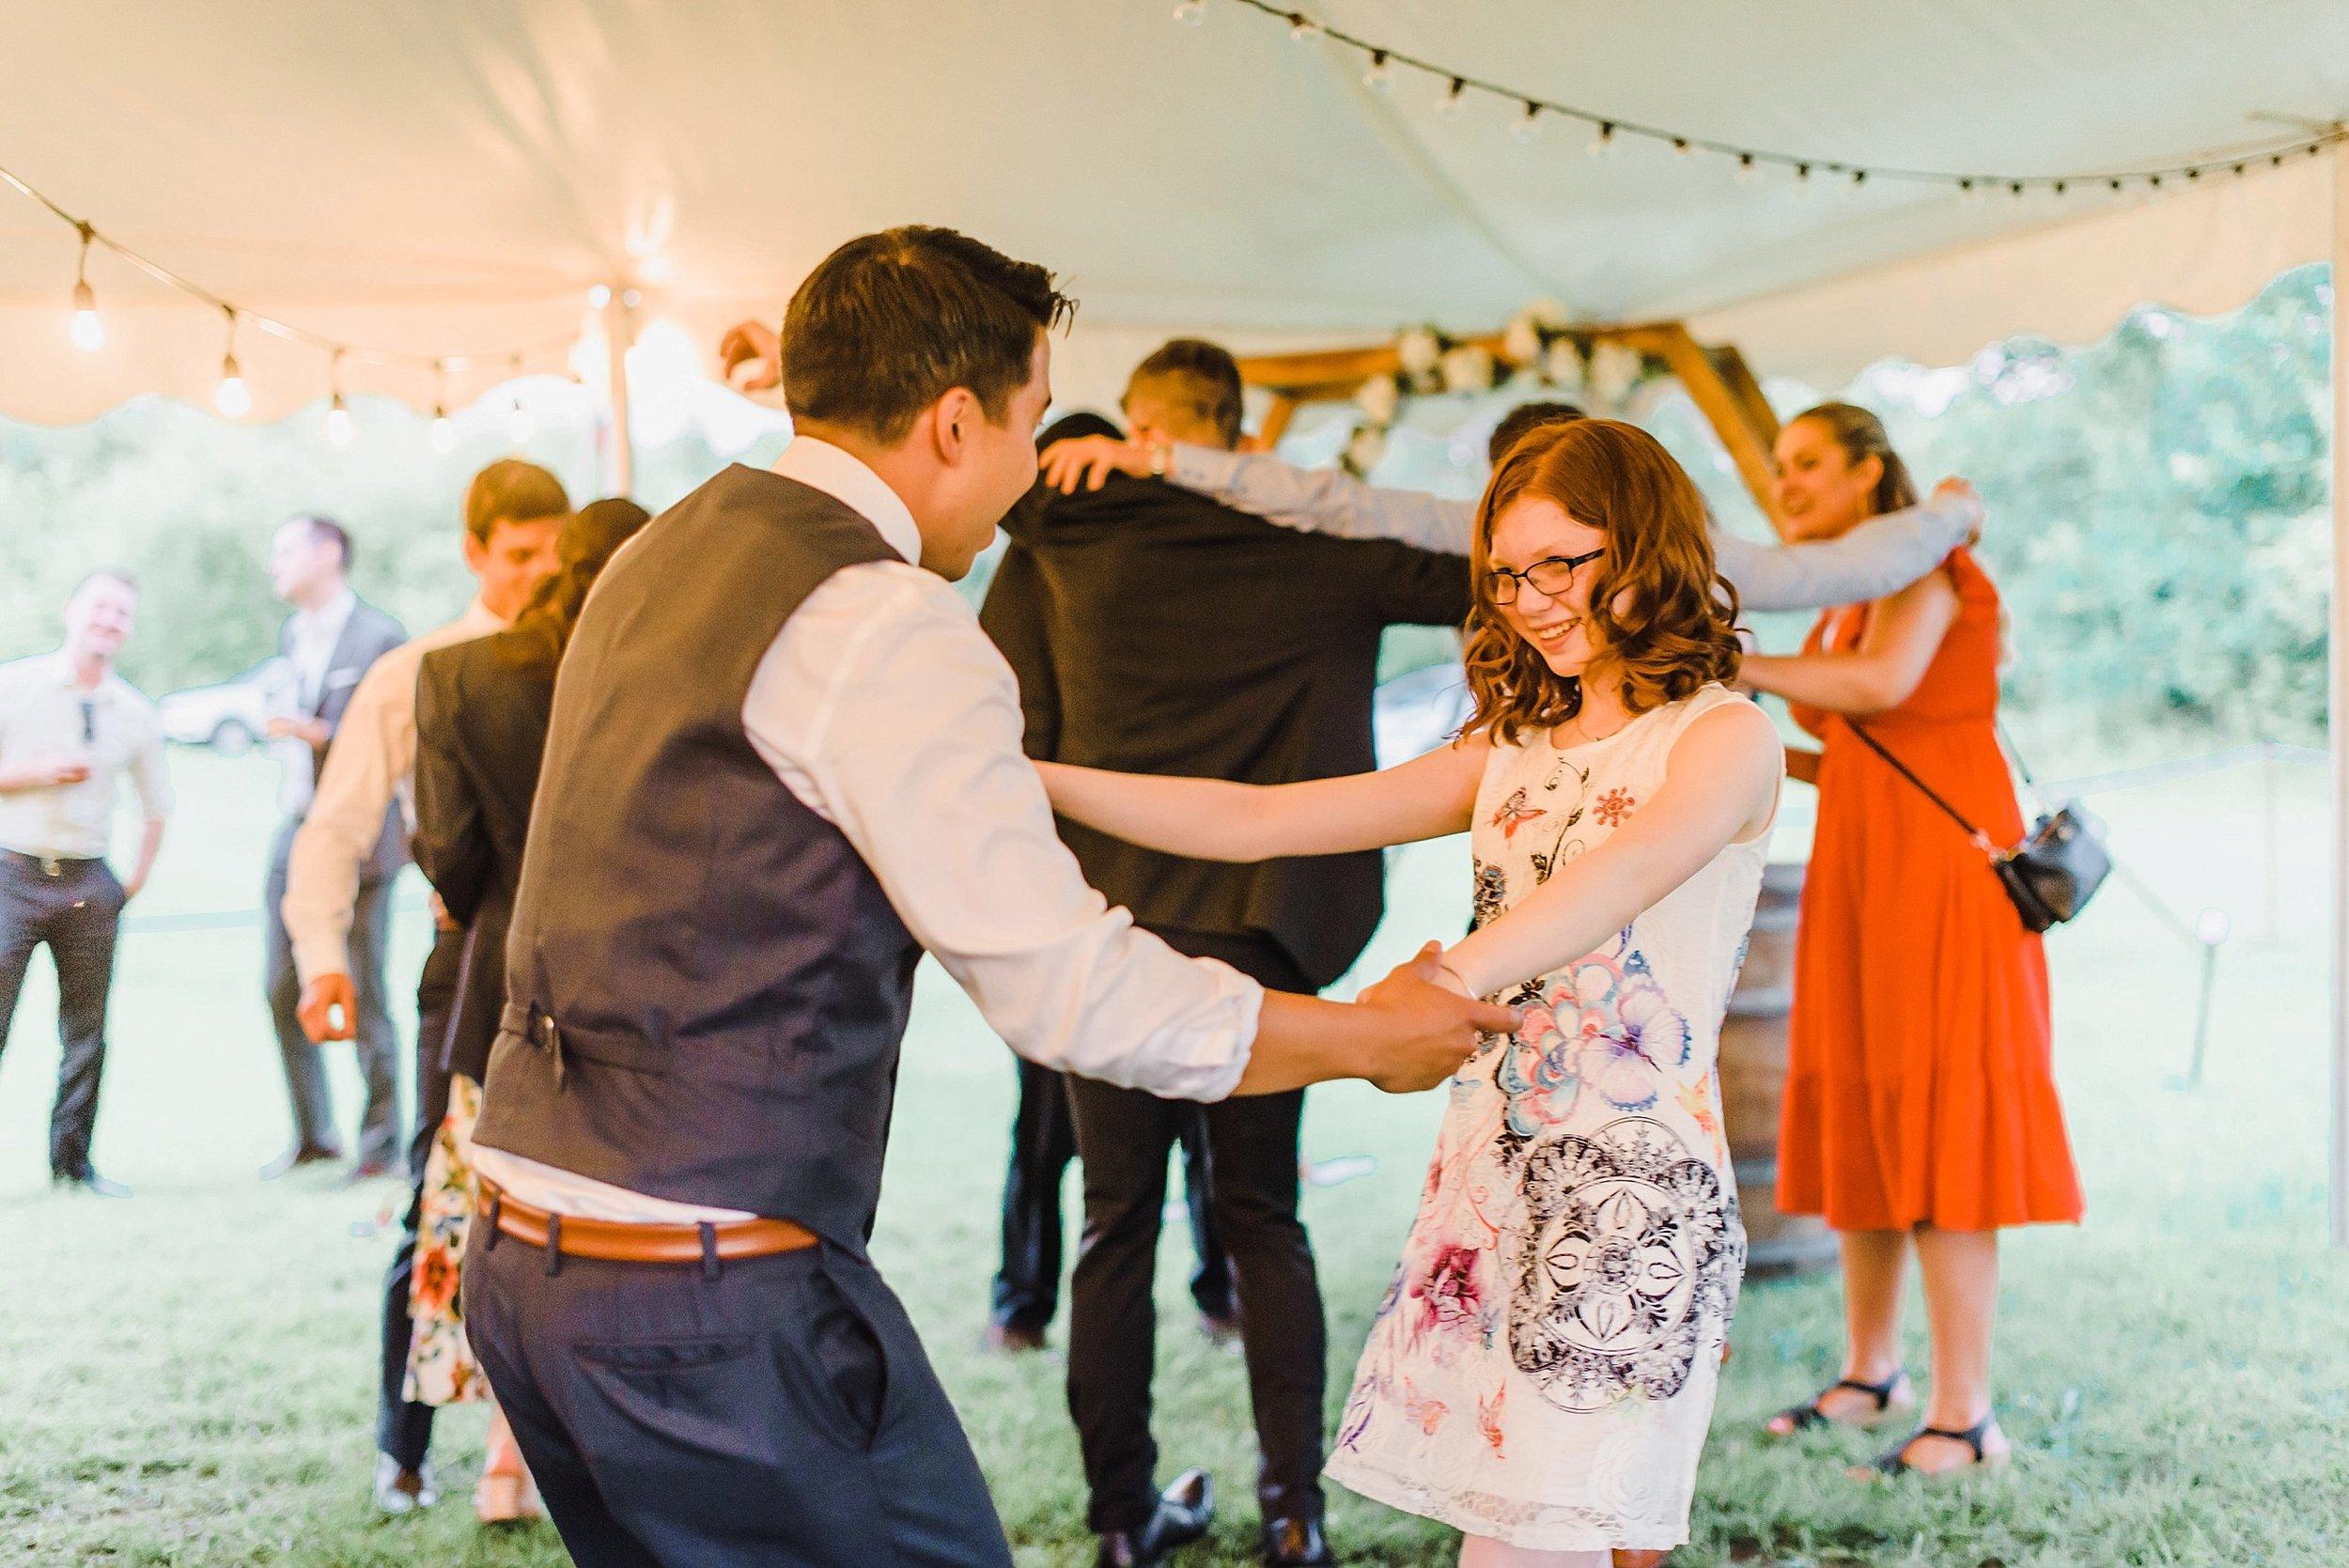 light airy indie fine art ottawa wedding photographer | Ali and Batoul Photography_0921.jpg